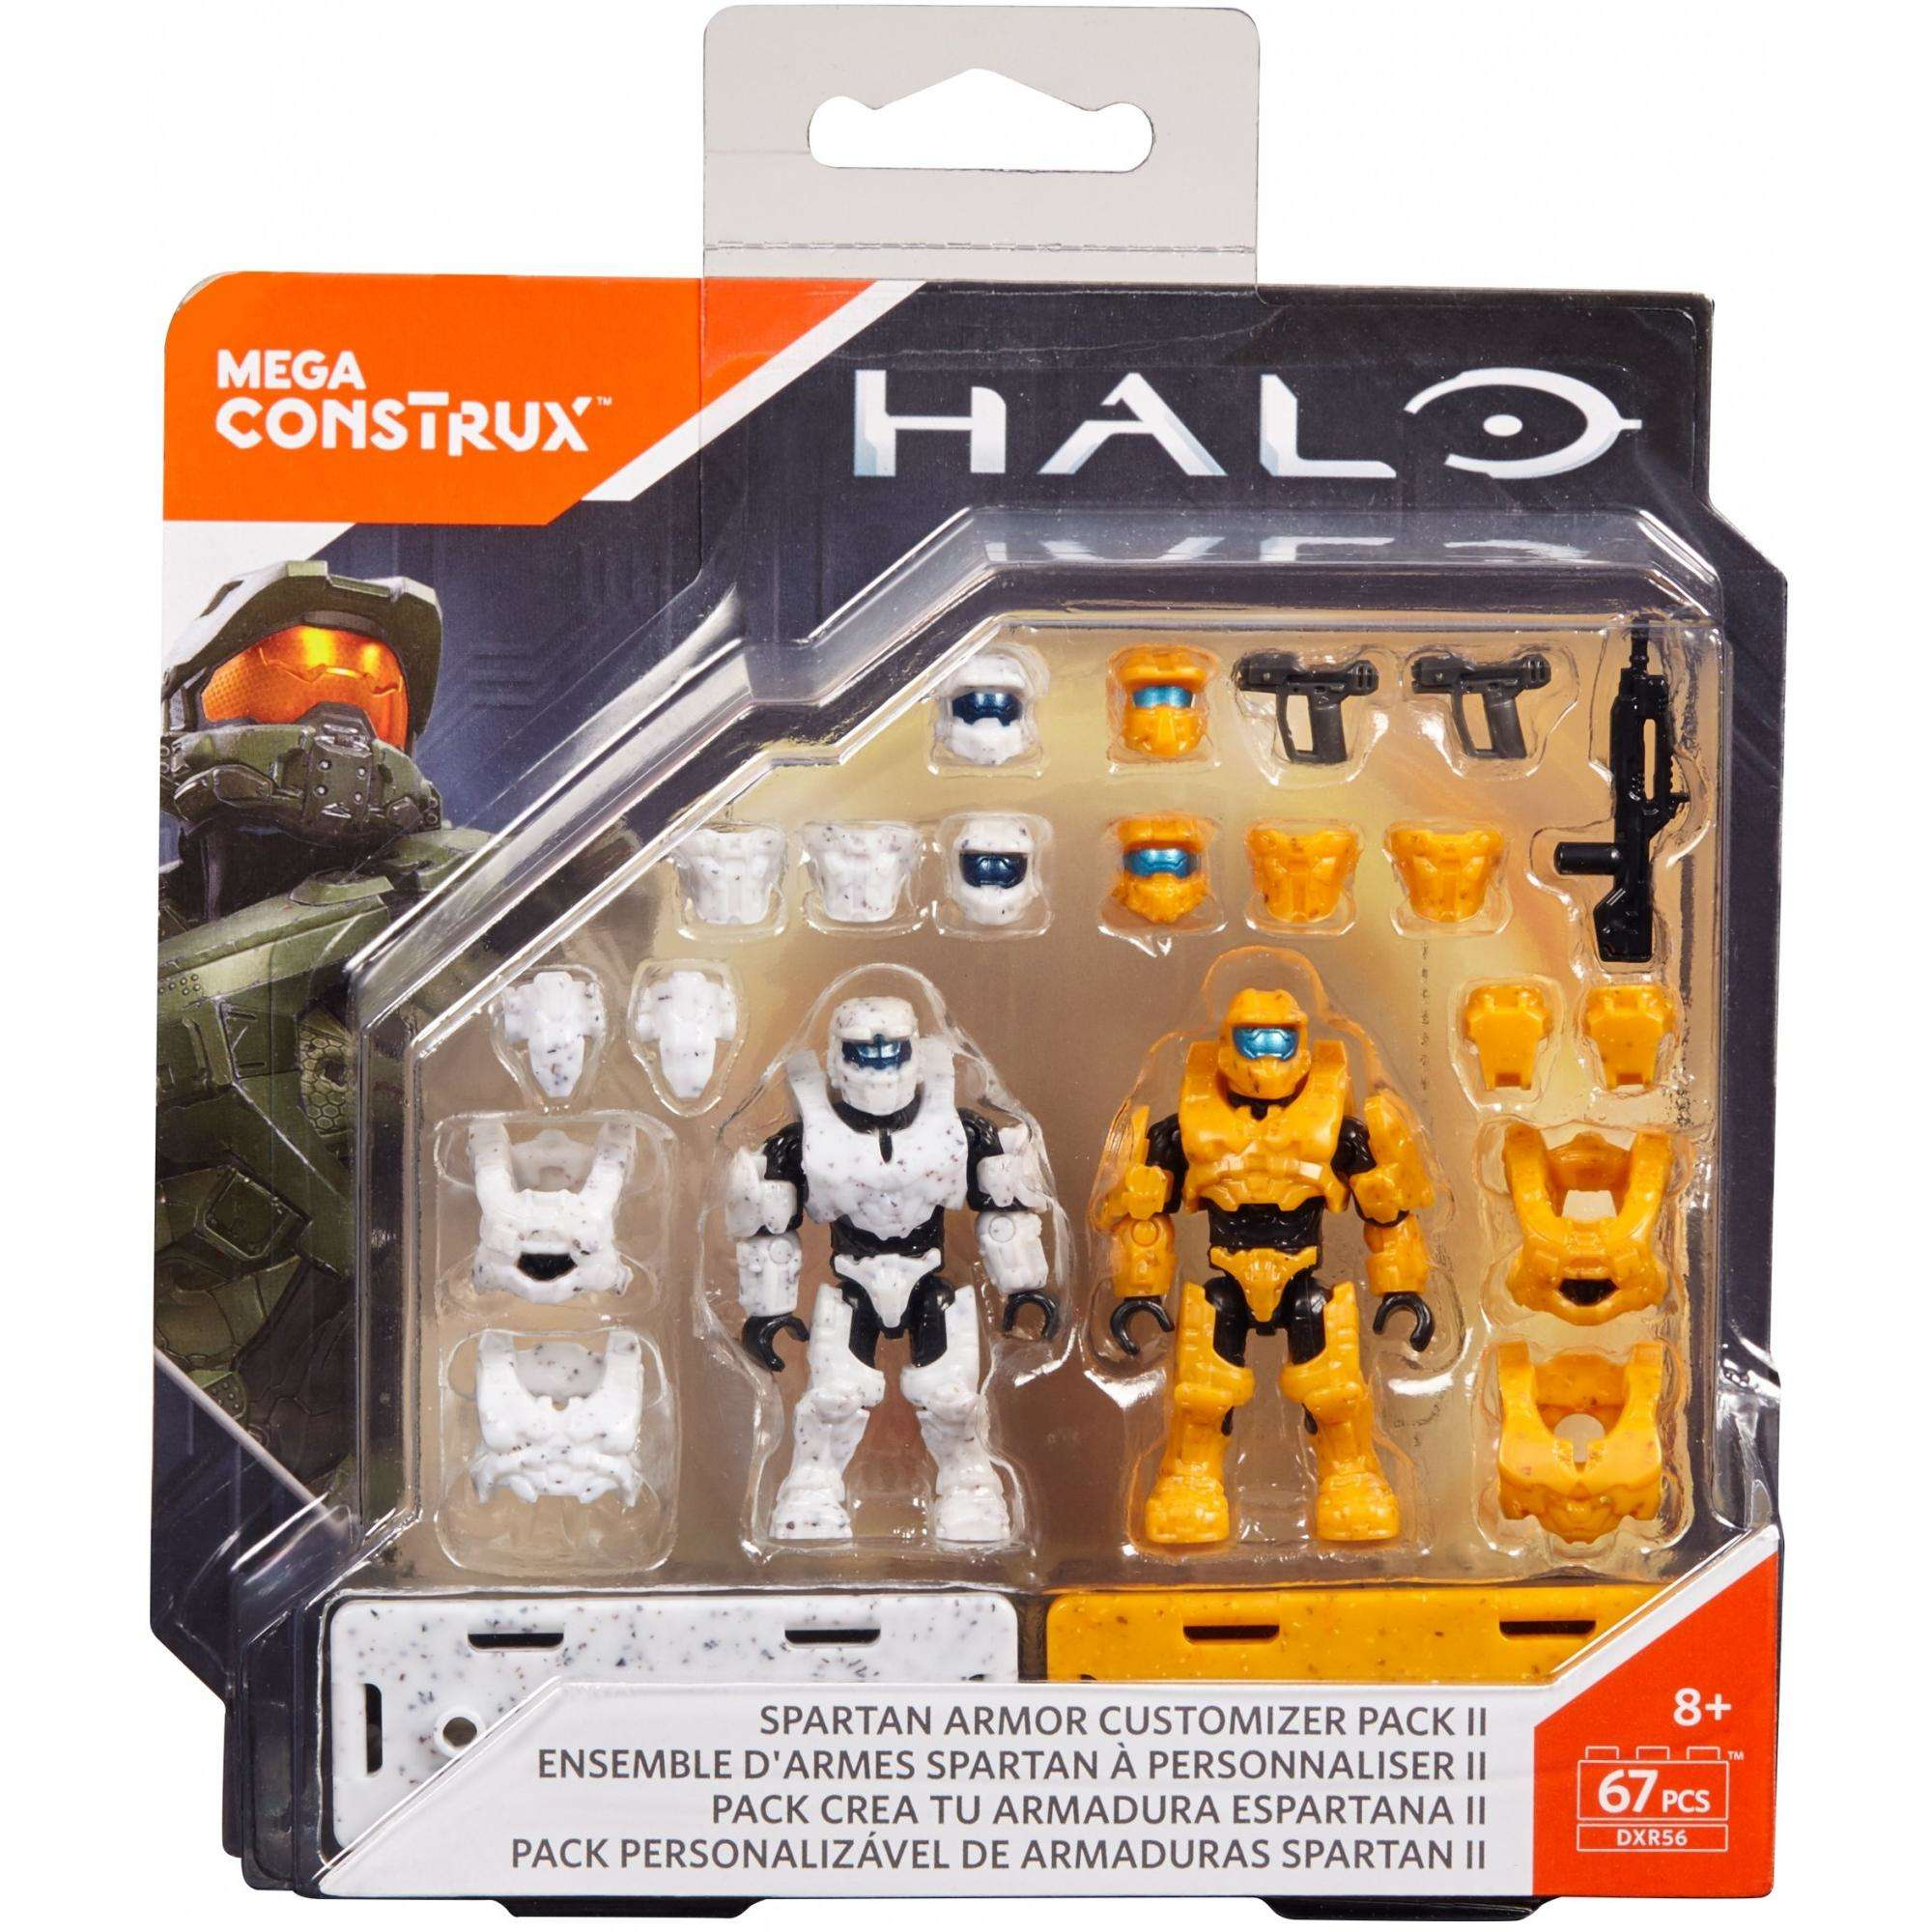 Mega Construx Halo Spartan Armor Customizer Pack